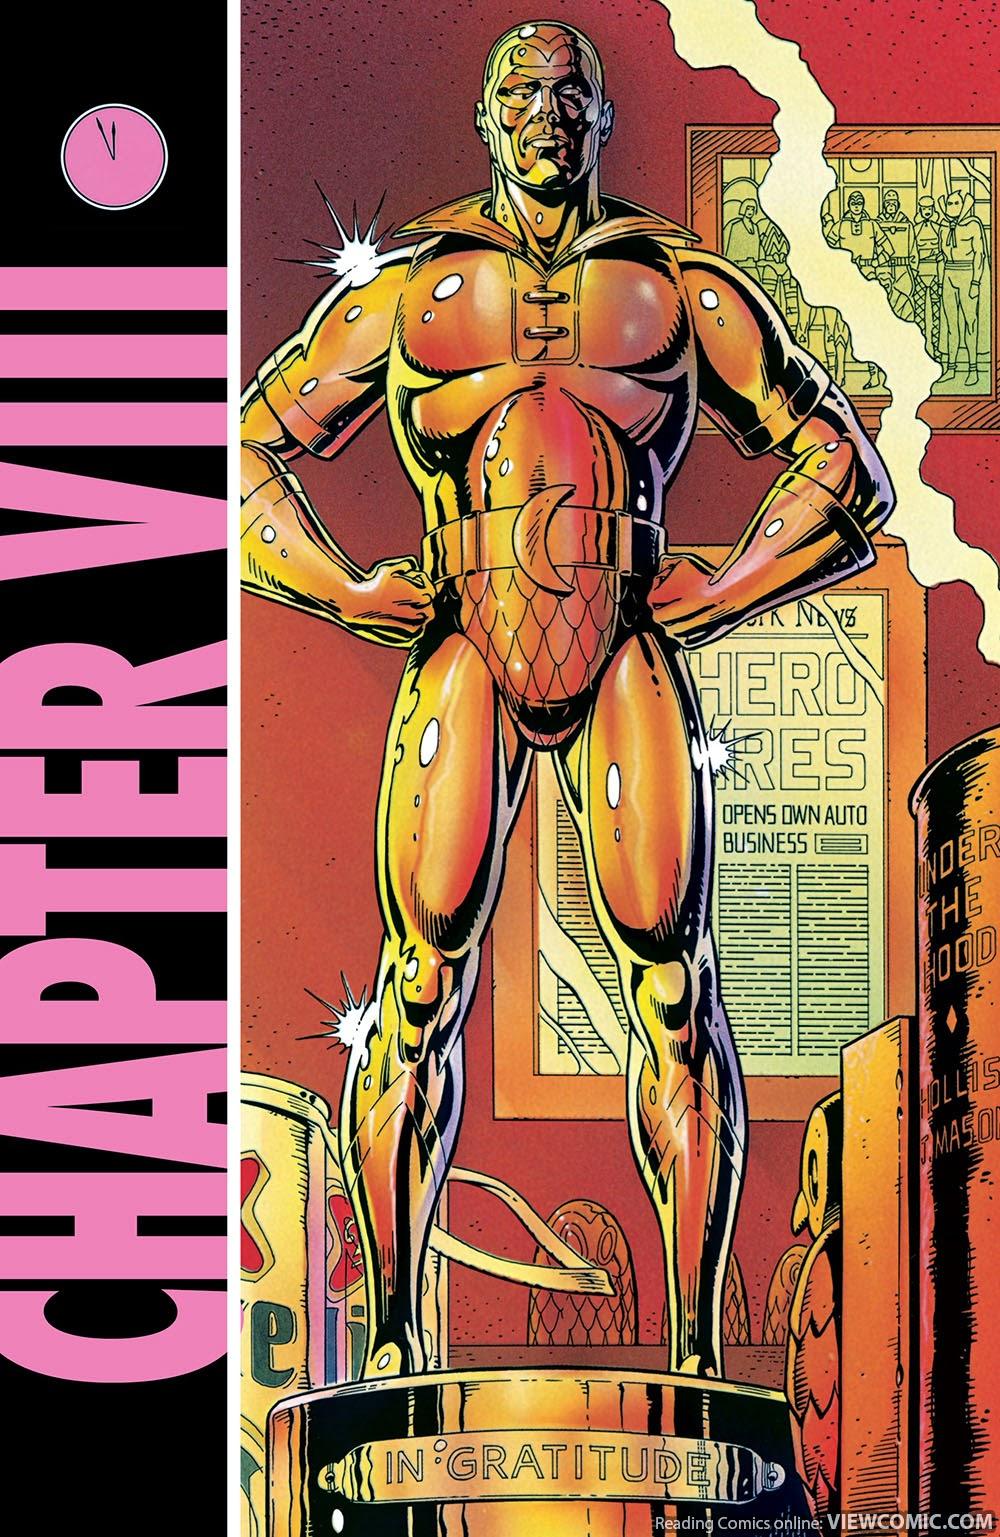 watchmen viewcomic reading comics online for free 2018 part 2